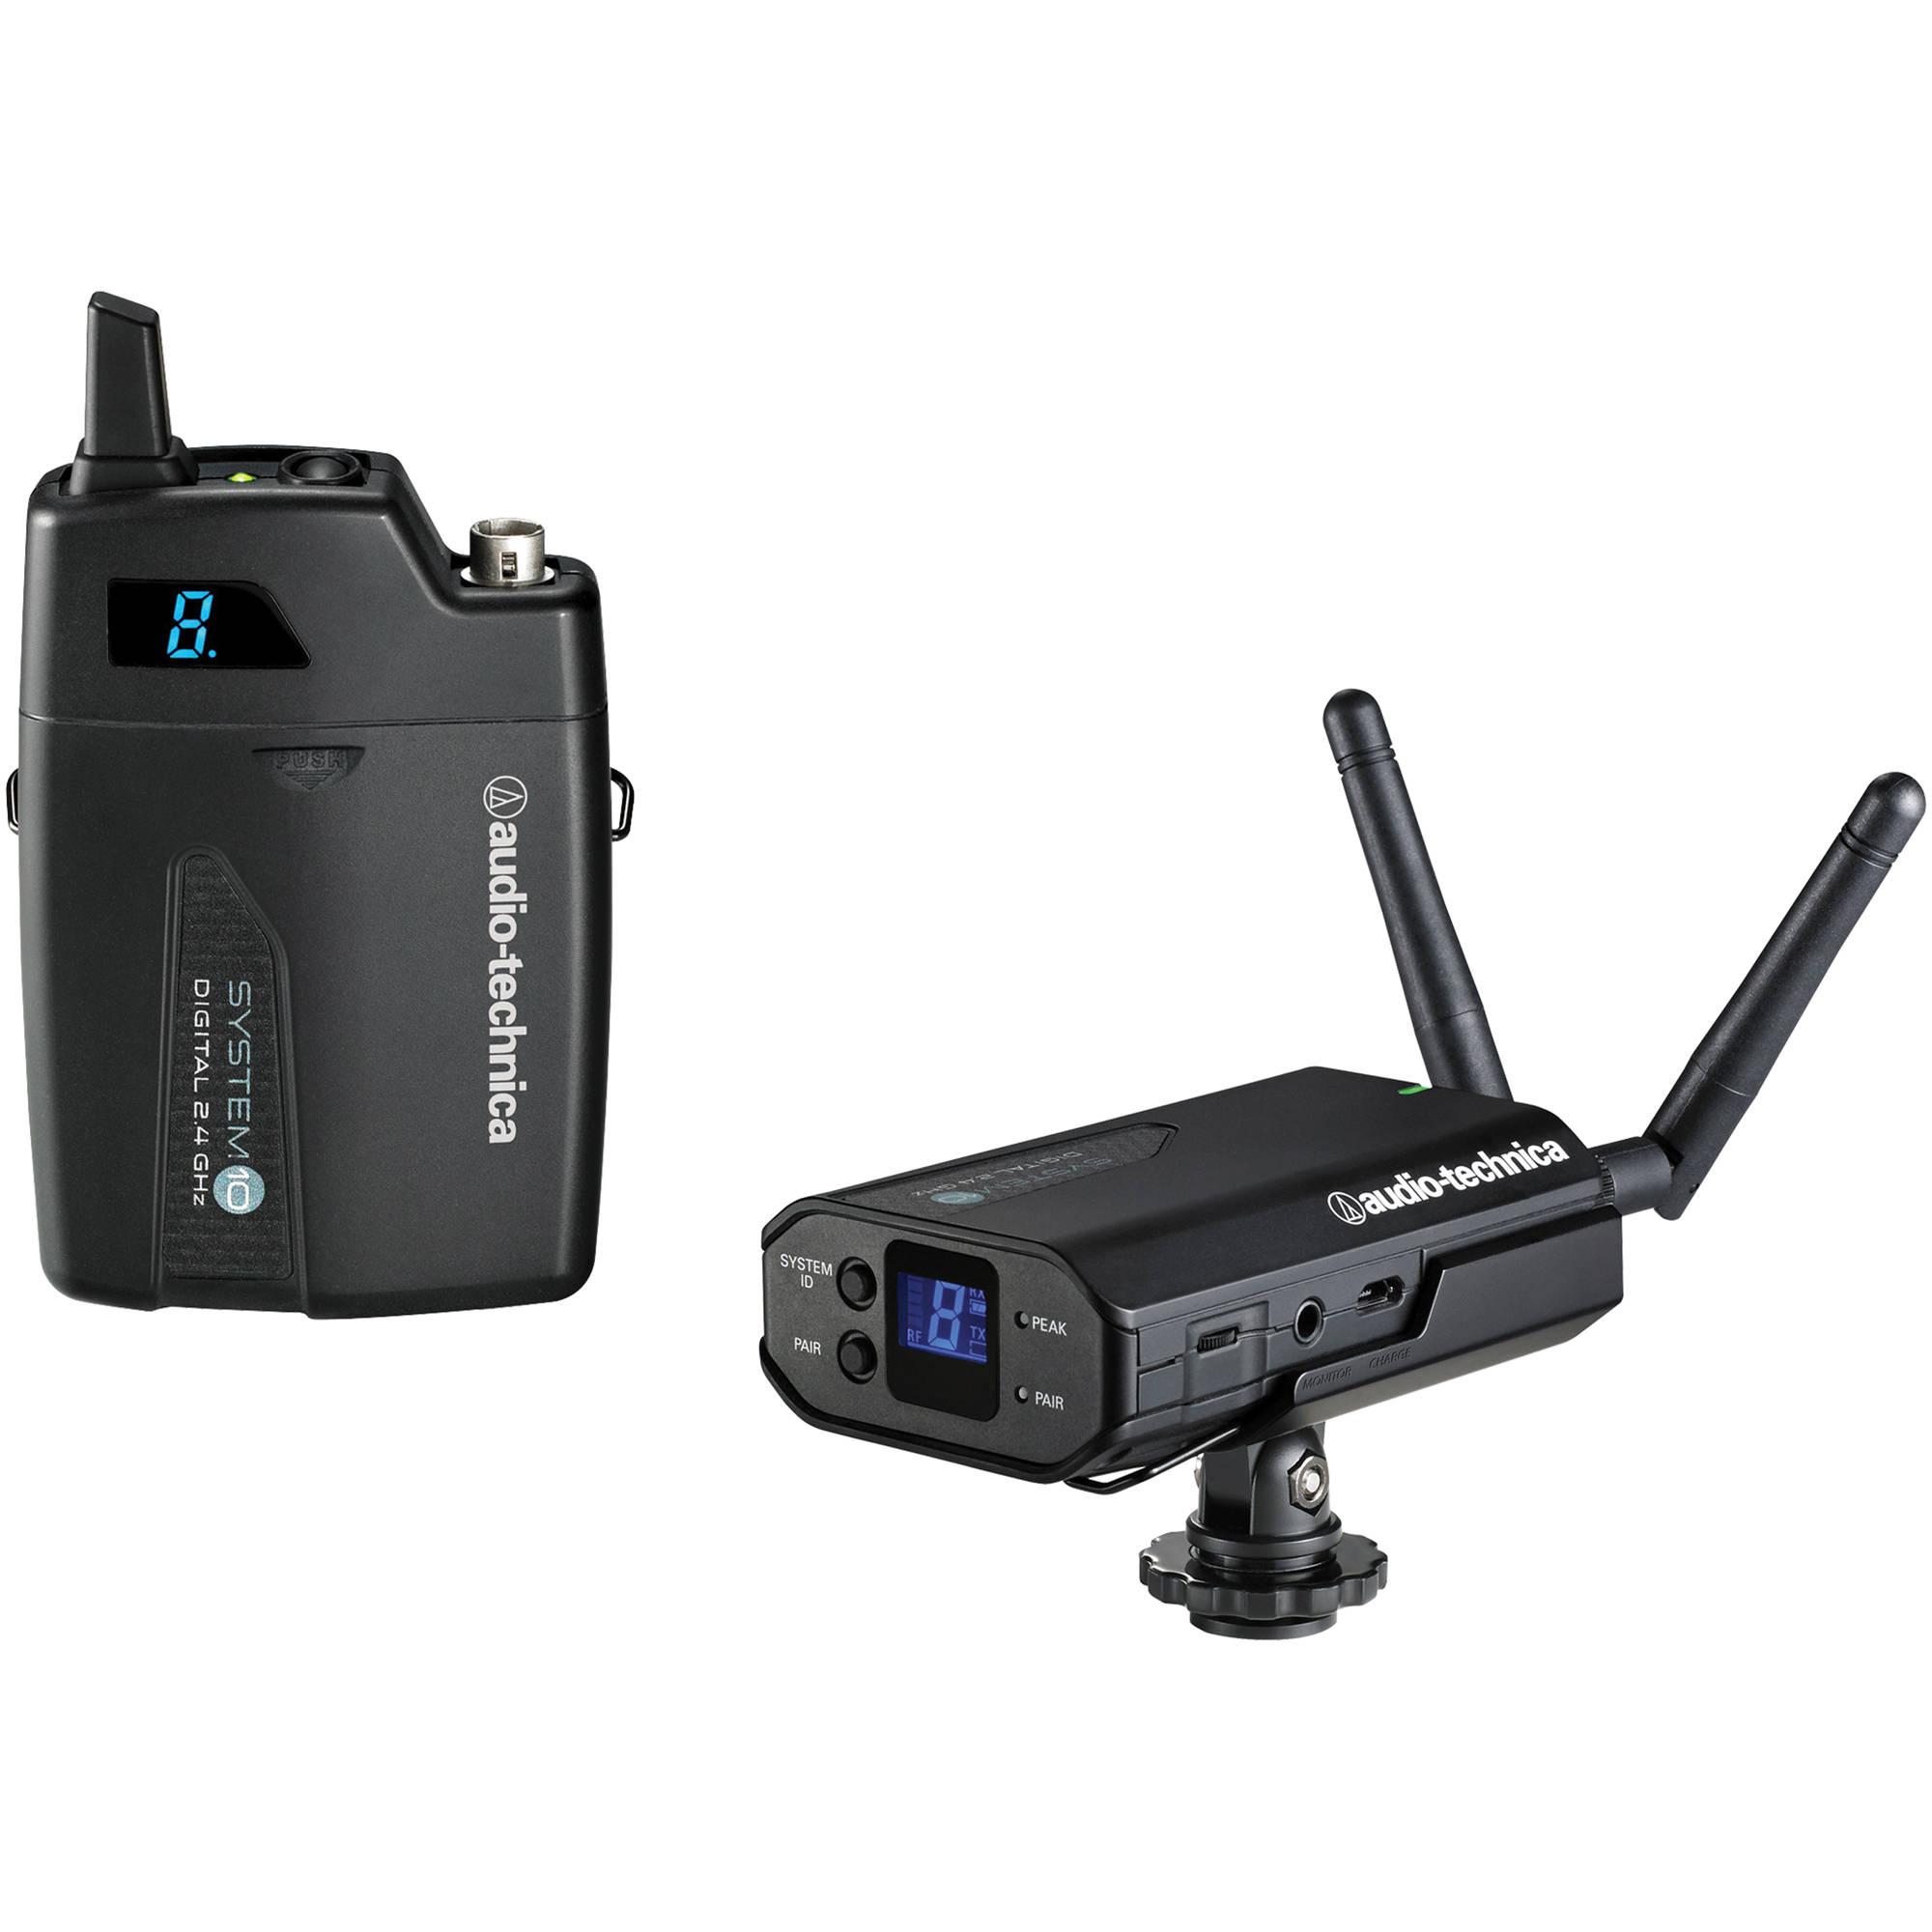 Audio Technica ATW-1701 Camera-Mount Digital Wireless Microphone System